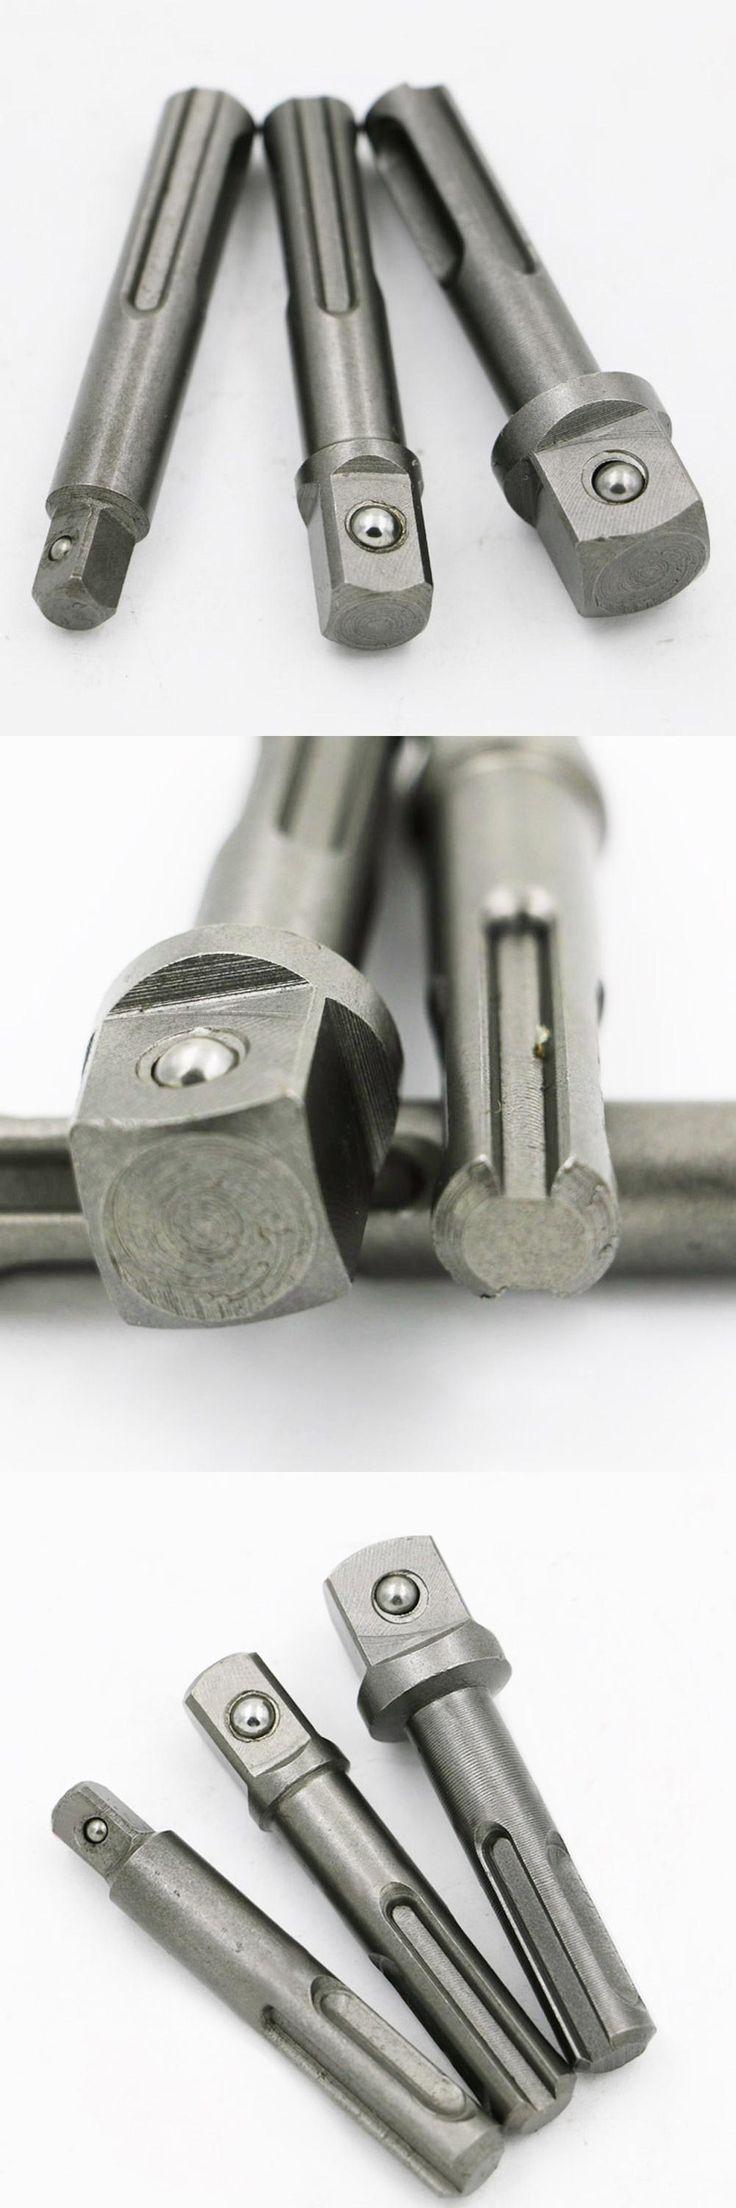 [Visit to Buy] 3Pcs/Set Power Extension Socket Driver 1/4 3/8 1/2 SDS Drill Chuck Adapter Converter hammer  impact drill Power Tool #Advertisement